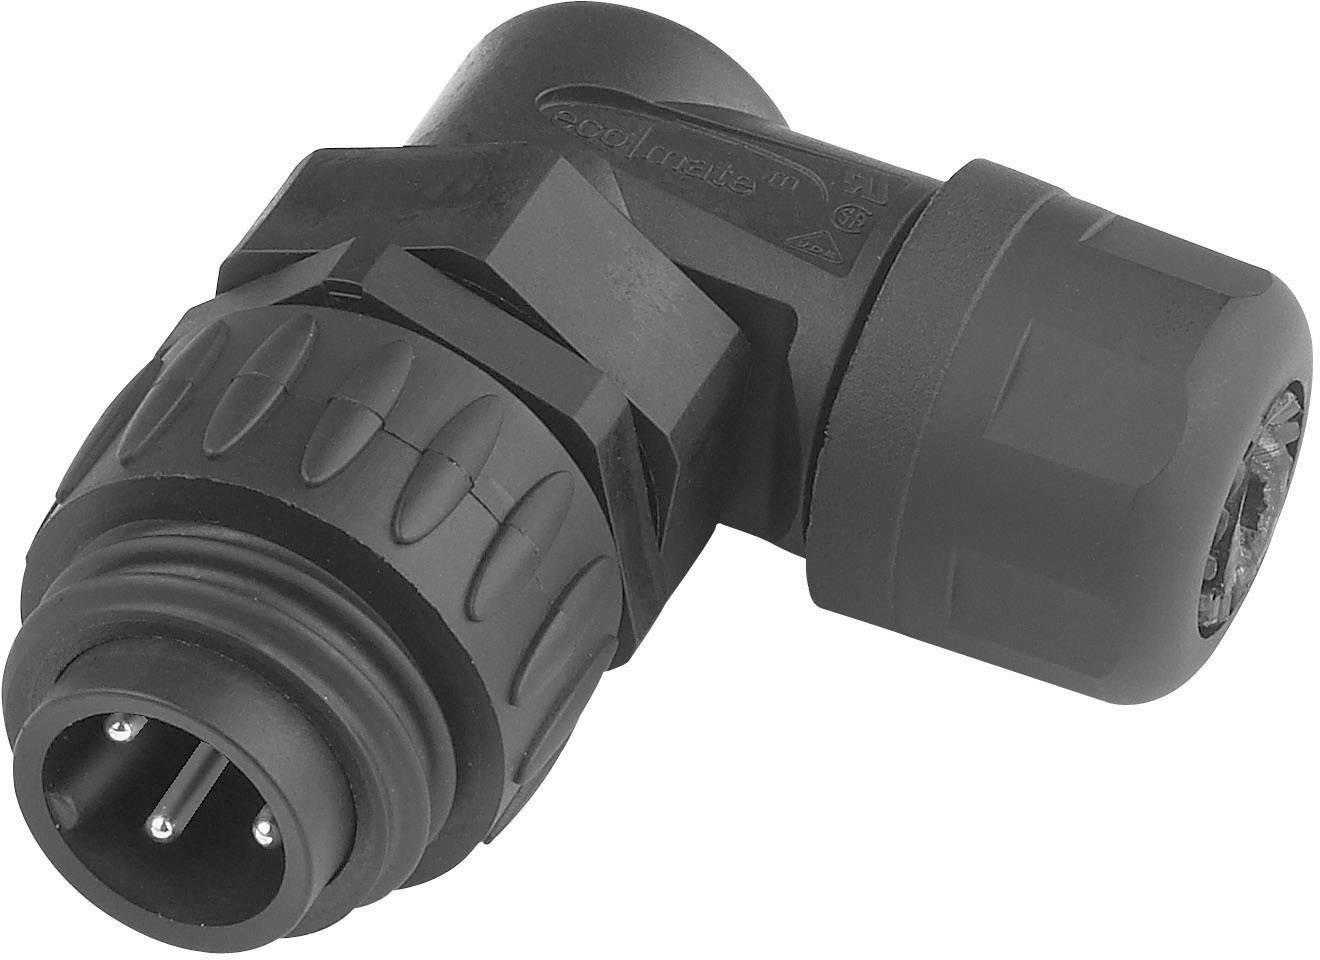 Kabelový konektor 6+PE Amphenol C016 10K006 000 12, černá